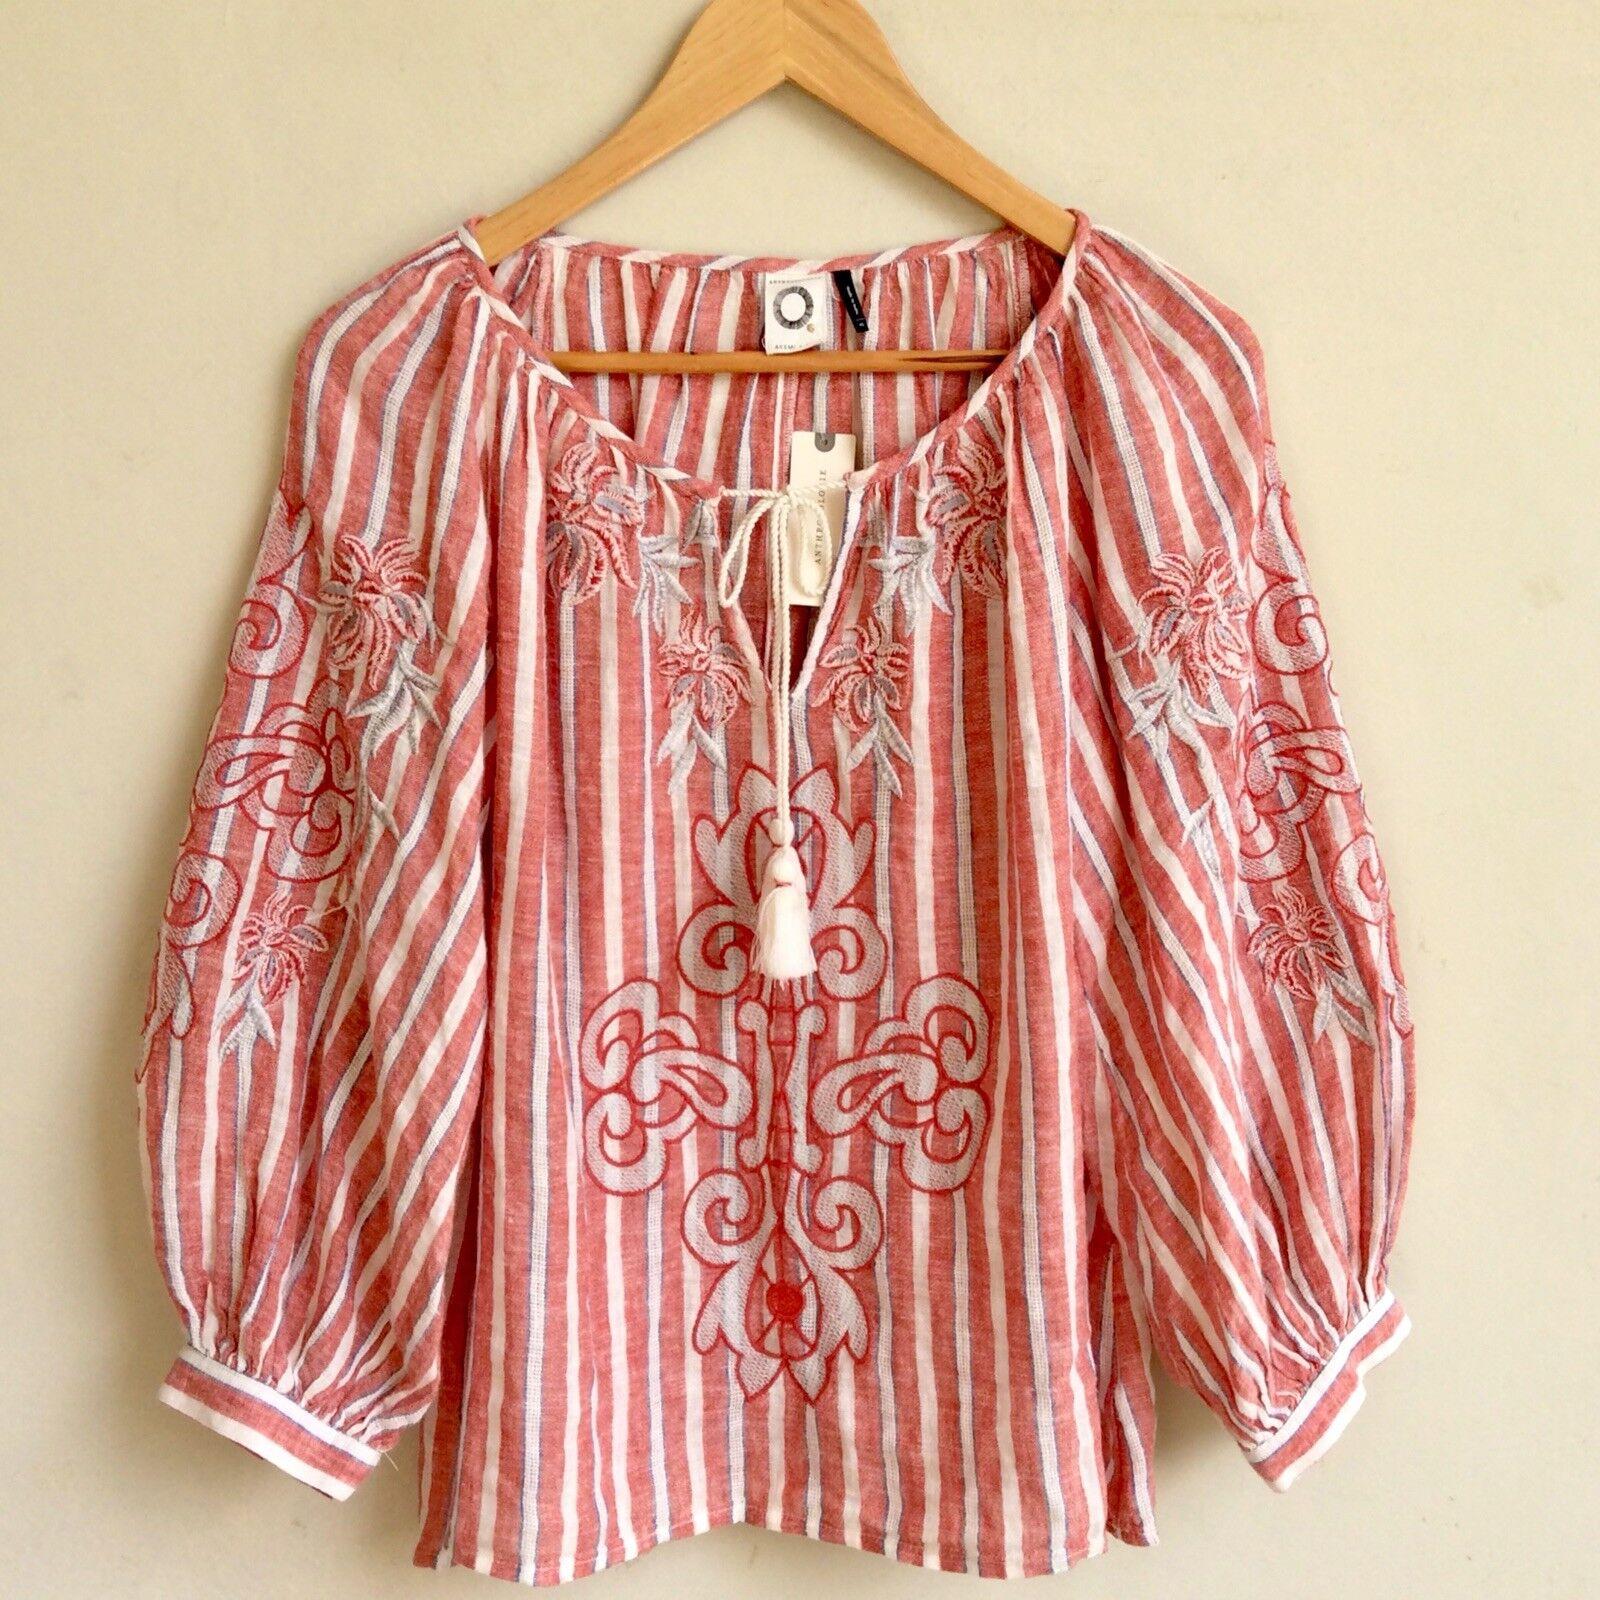 ANTHROPOLOGIE AKEMI + KIN Peasant Blouse Größe XS Embroiderot Puff Sleeve rot Top